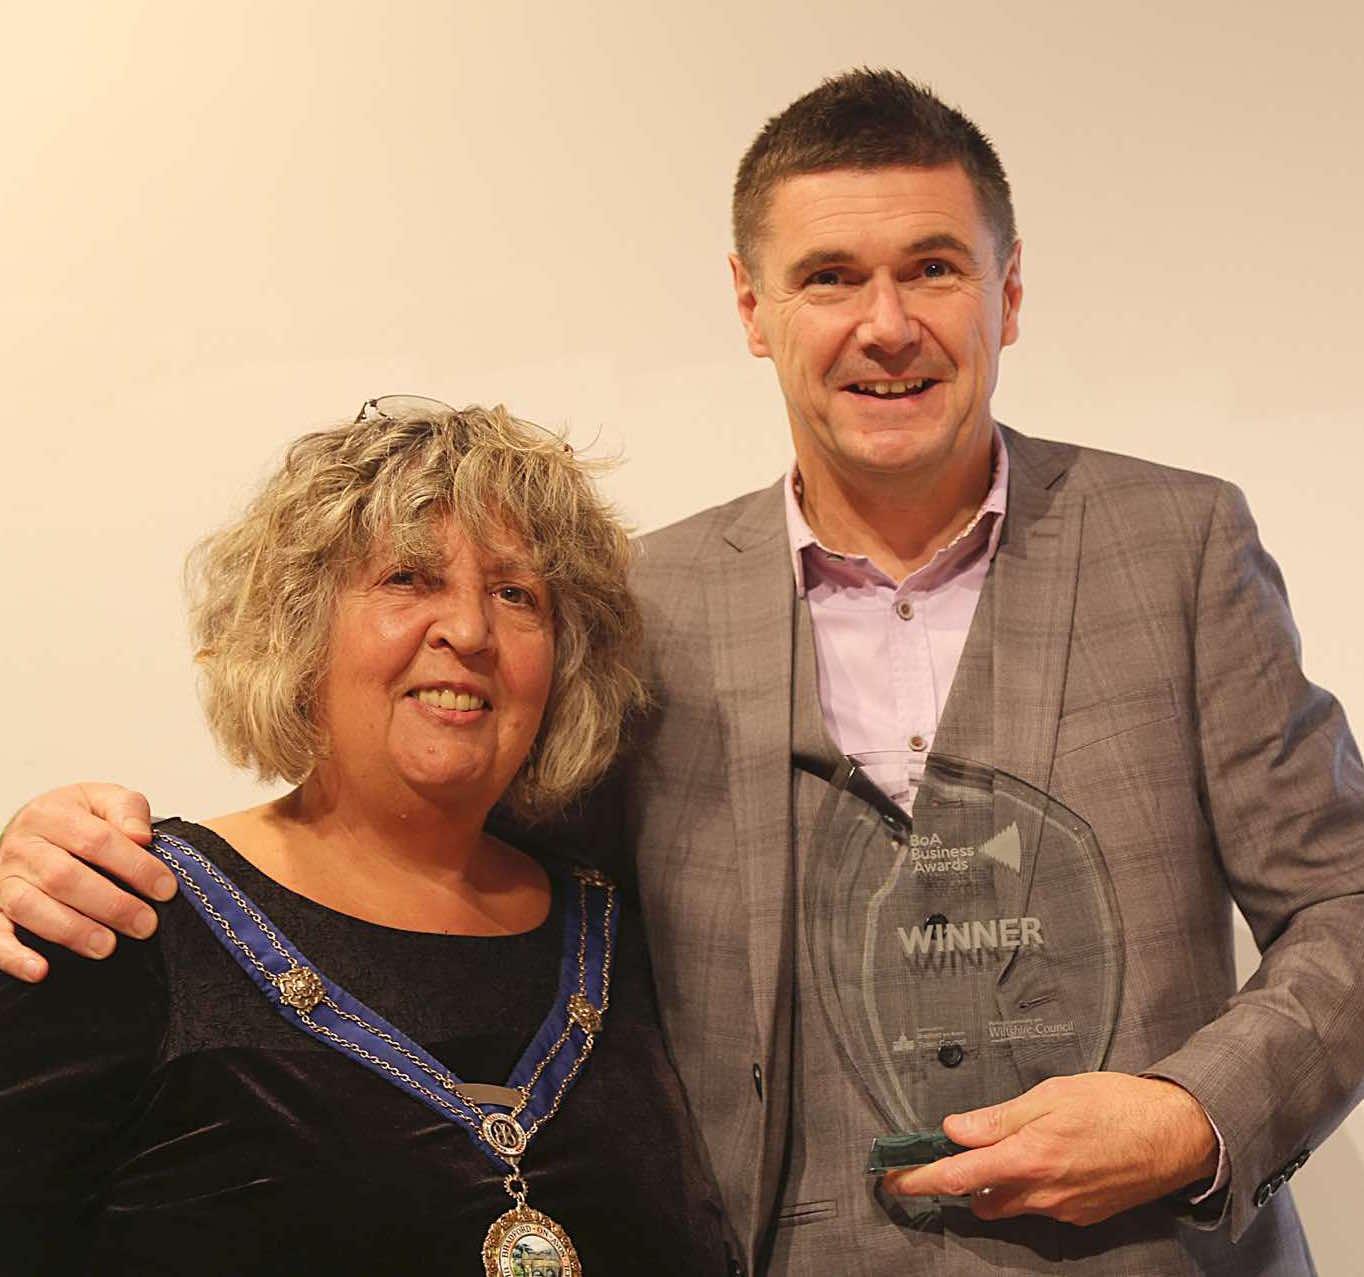 Neil Coxon receiving BOA Business Award